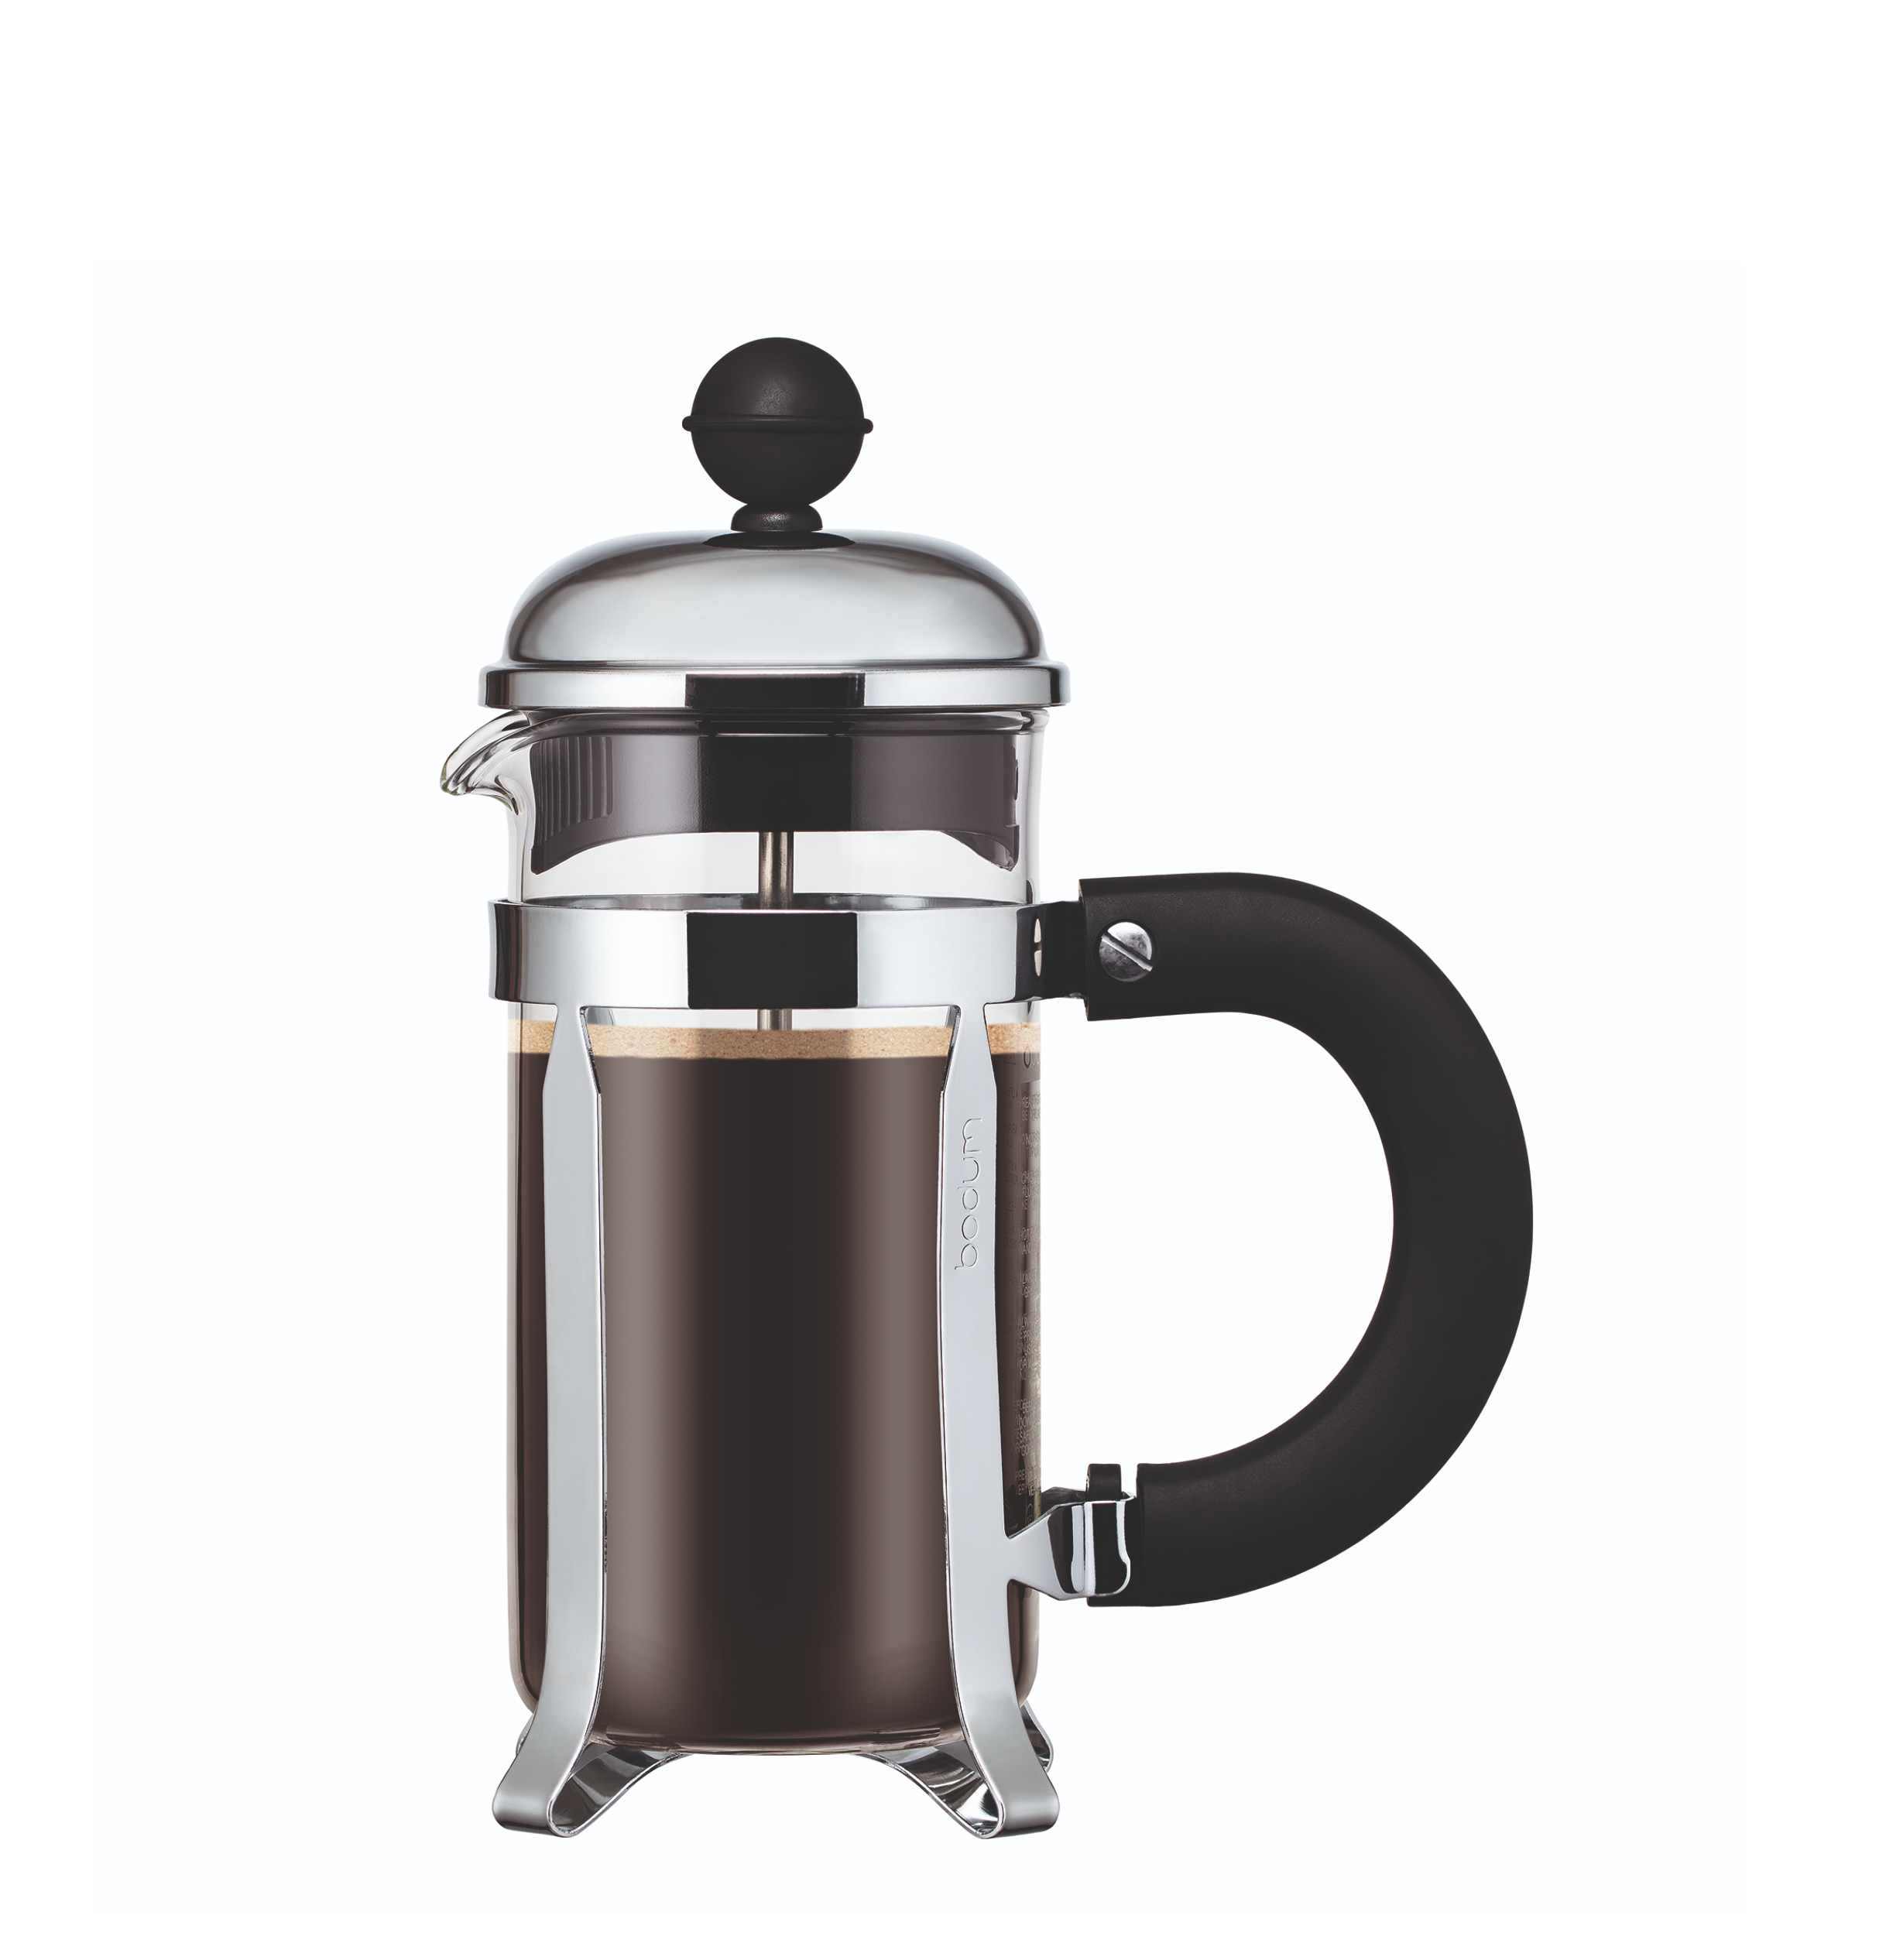 Bodum Cafeti?re Chambord RVS 0.35 Liter